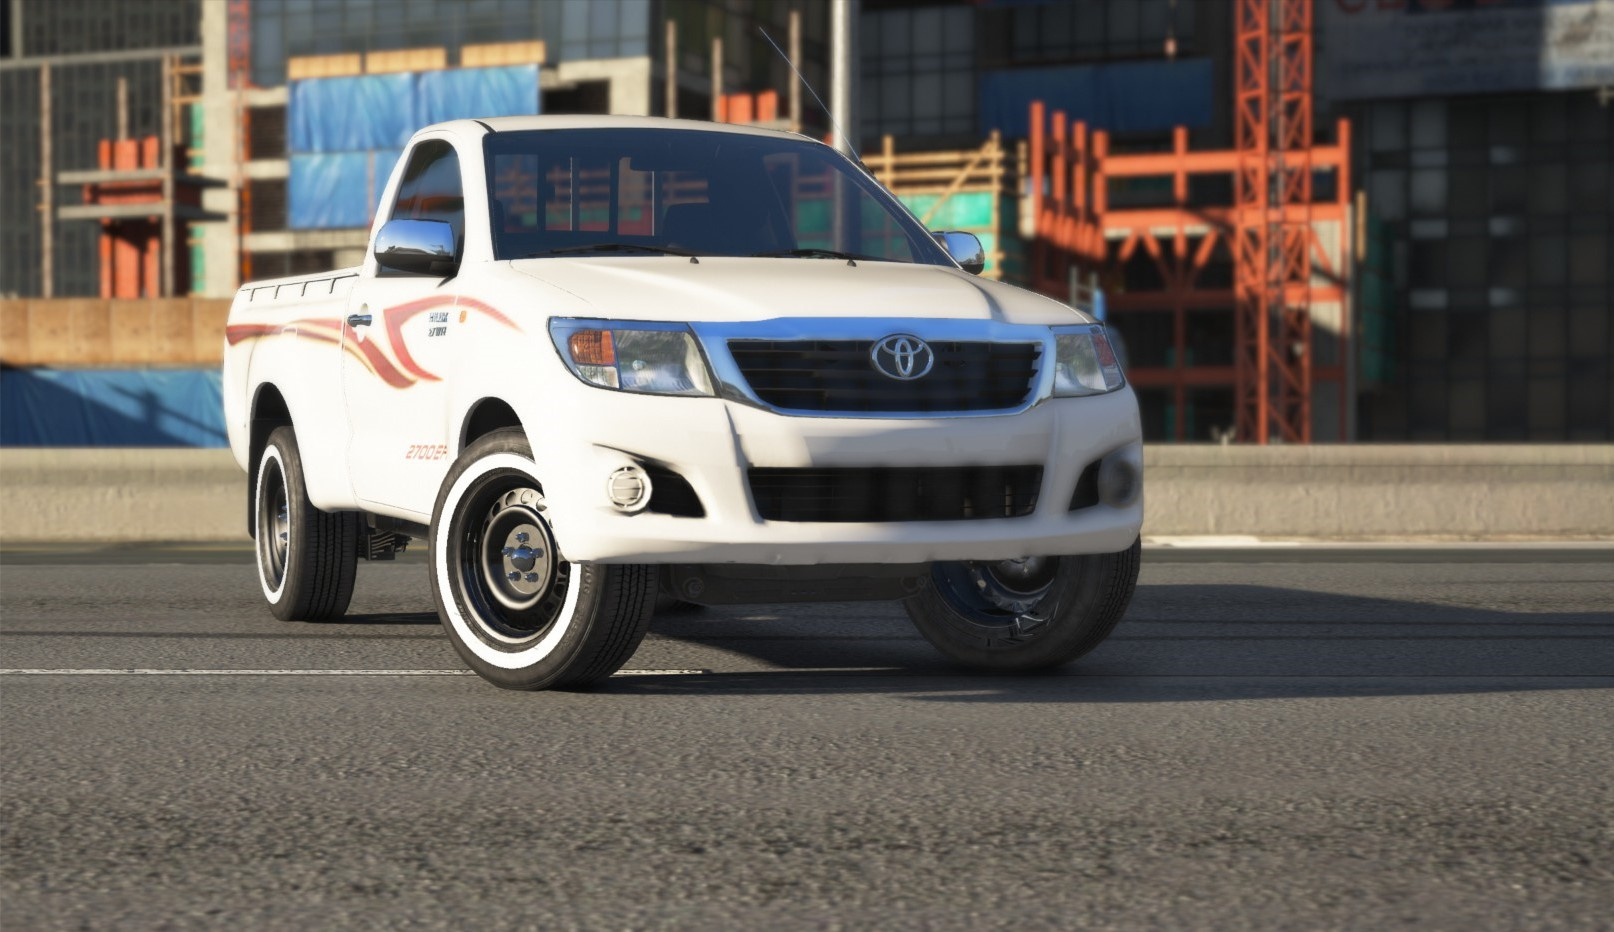 Toyota Hilux Vigo 2012-2015 [Add-On   Version 3   Livery